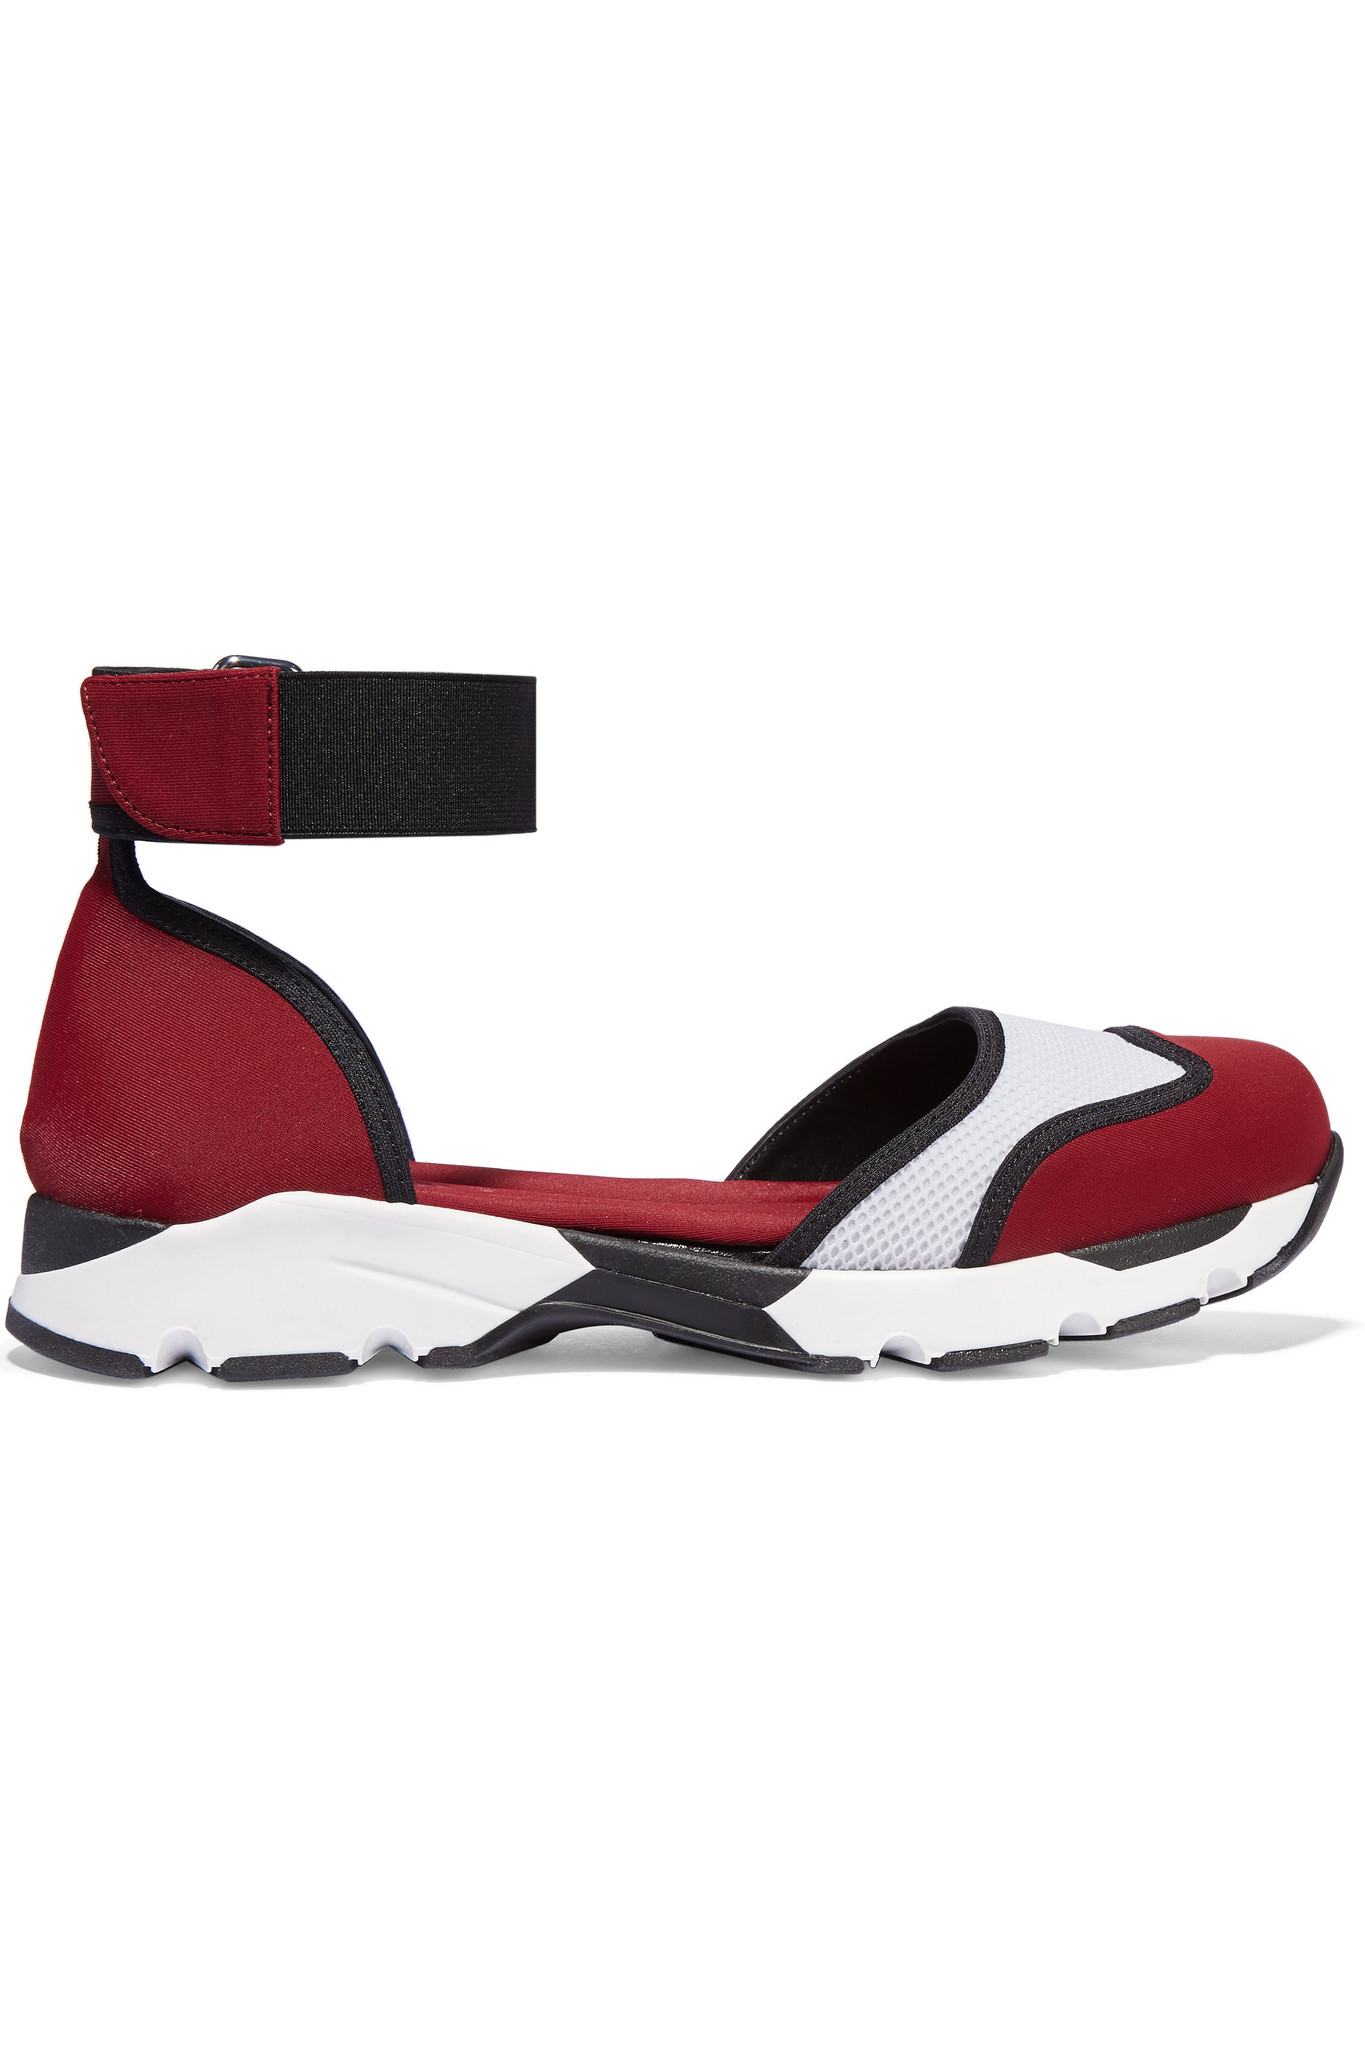 Marni cutout sneakers choice cheap online ftv5cJVB